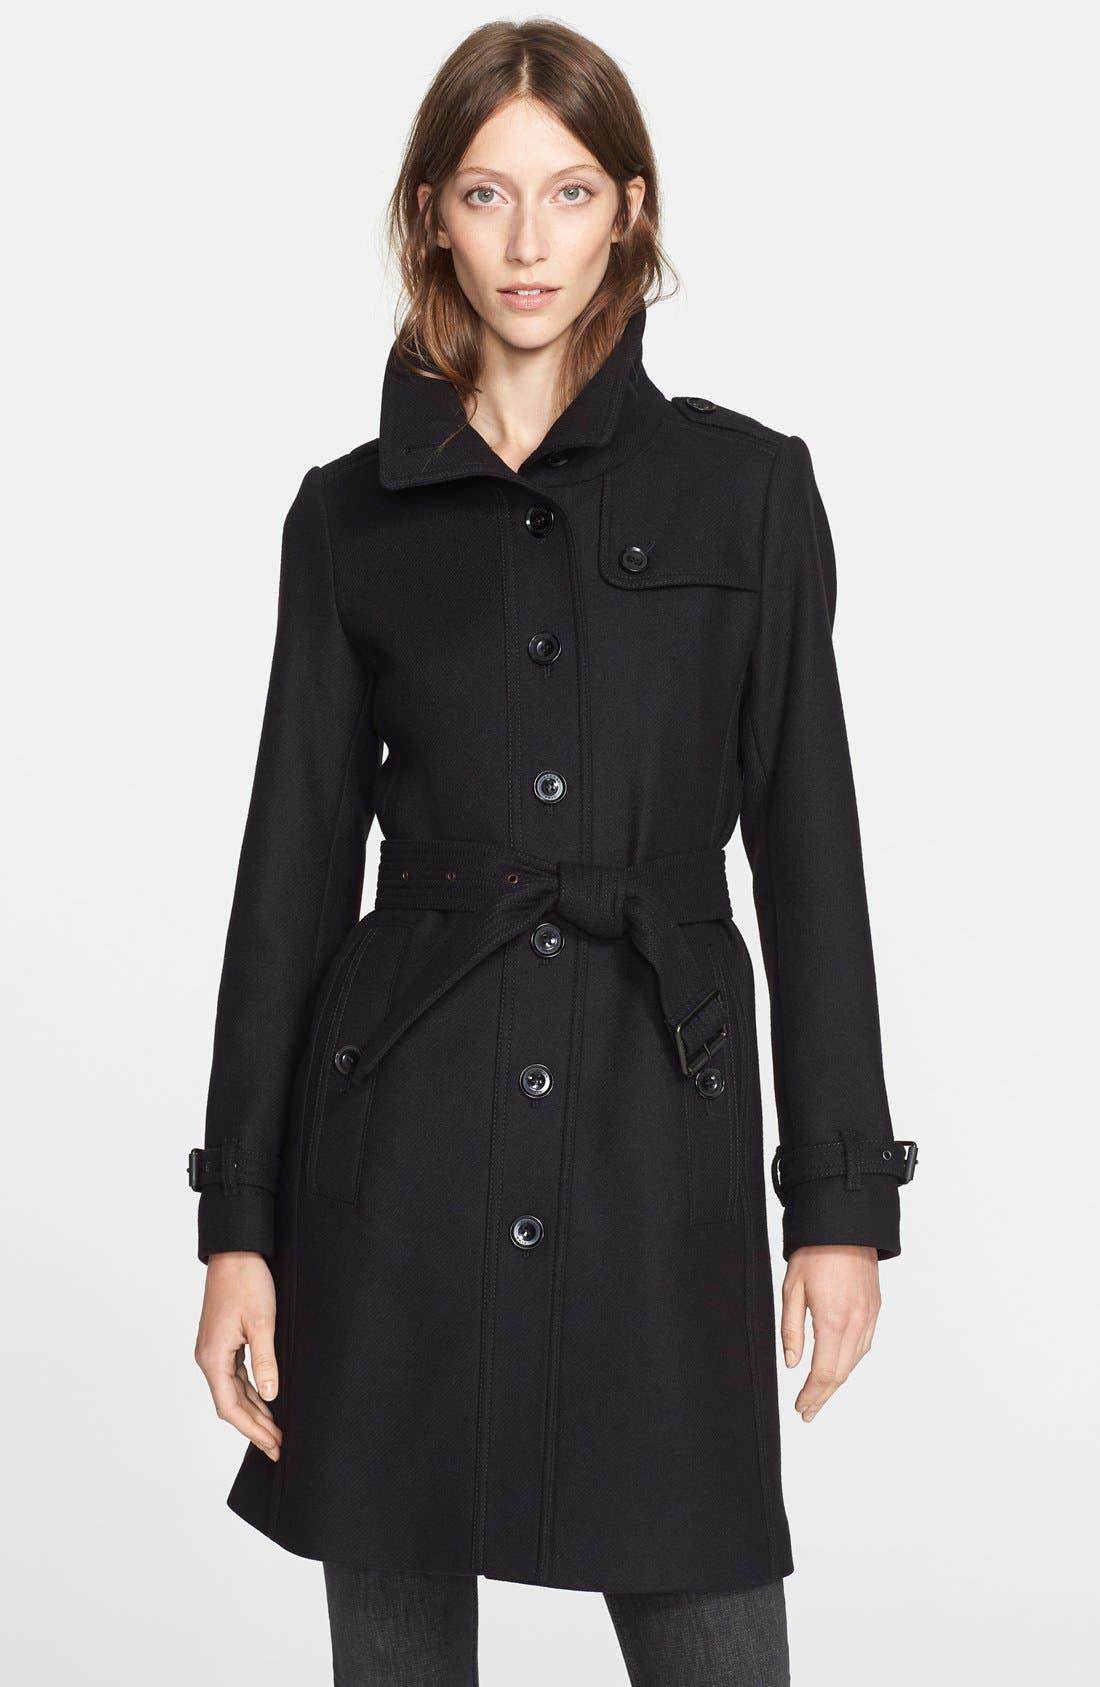 'Rushfield' Wool Blend Single Breasted Coat,                         Main,                         color, 001